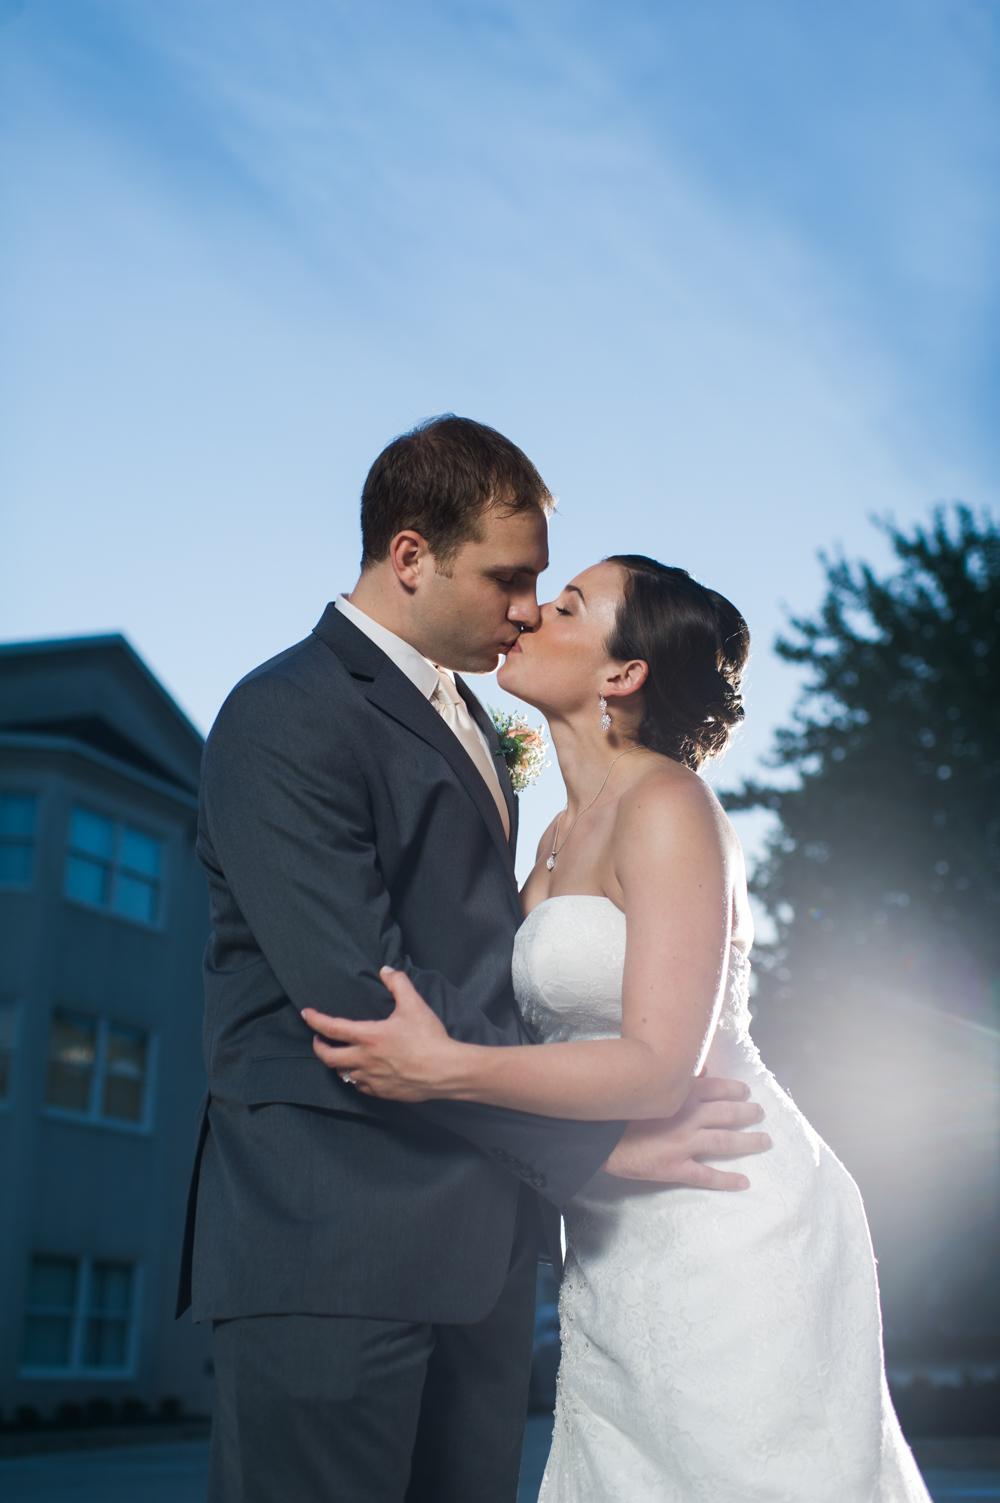 Mendenhall_Inn_Wedding_Pennsylvania_Rebecca_Watkins_Photography_2014-074.jpg